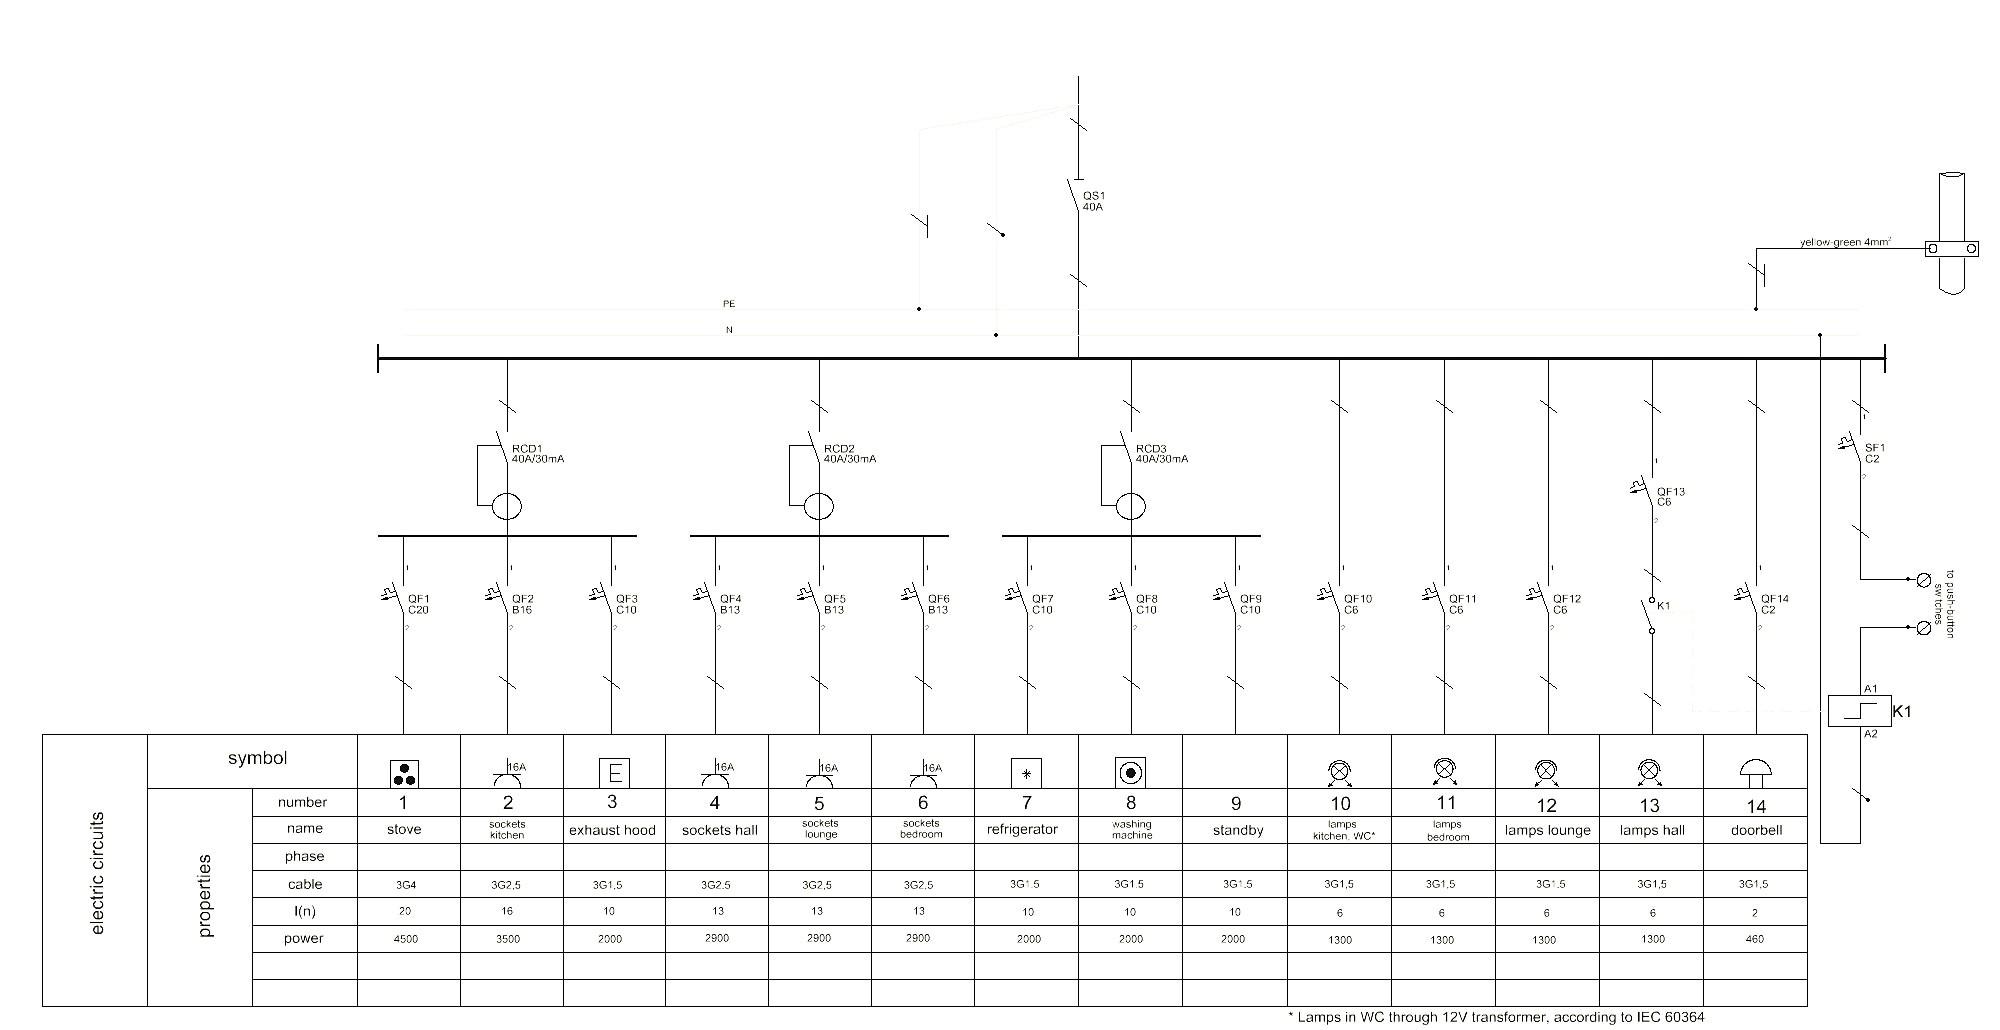 single line diagram electrical house wiring my wiring diagram rh detoxicrecenze com single line diagram electrical house wiring single line diagram vs wiring diagram